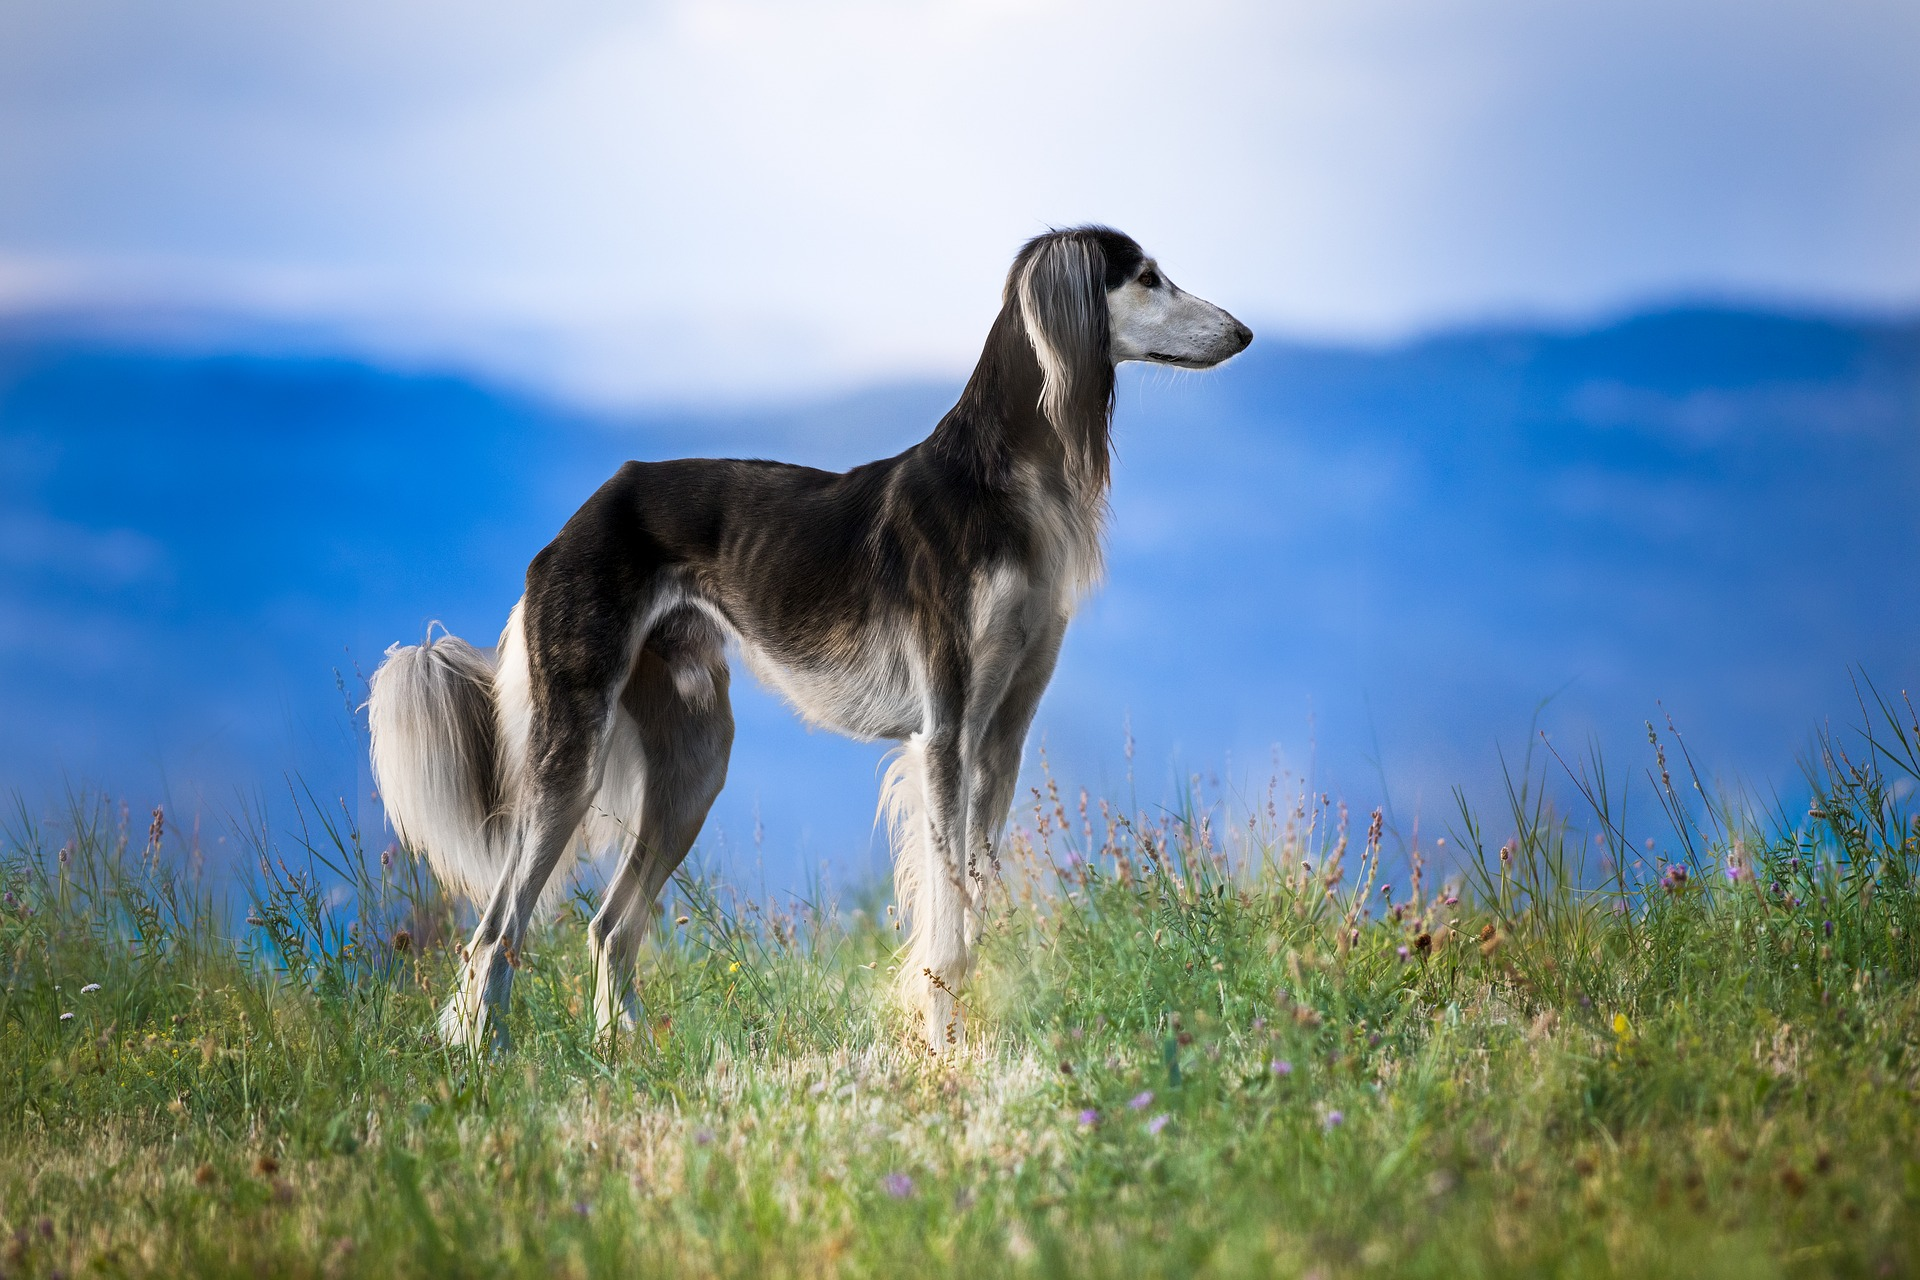 dog-3011990_1920.jpg